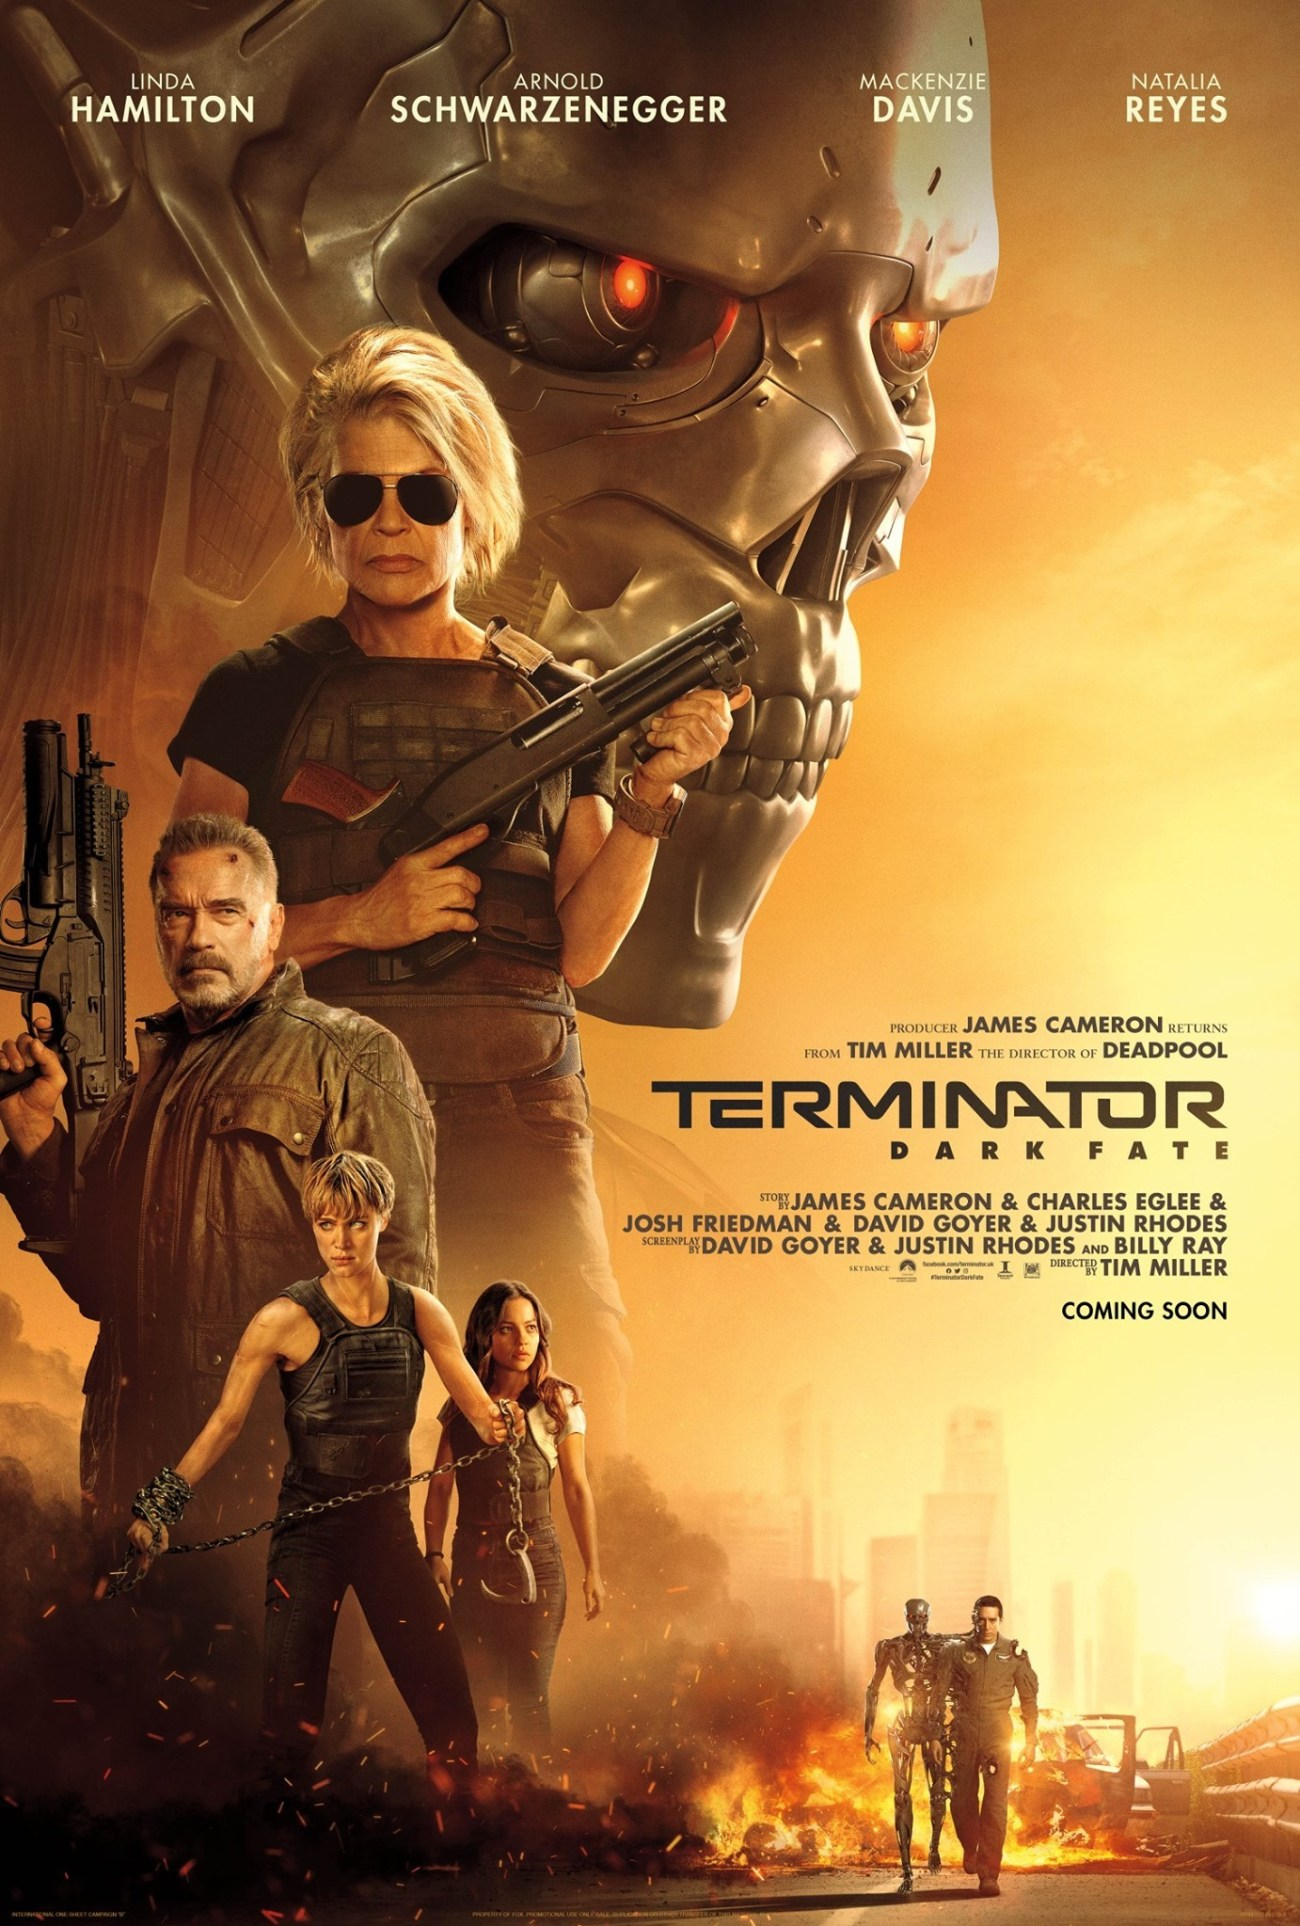 Póster de Terminator: Dark Fate (2019). Imagen: impawards.com